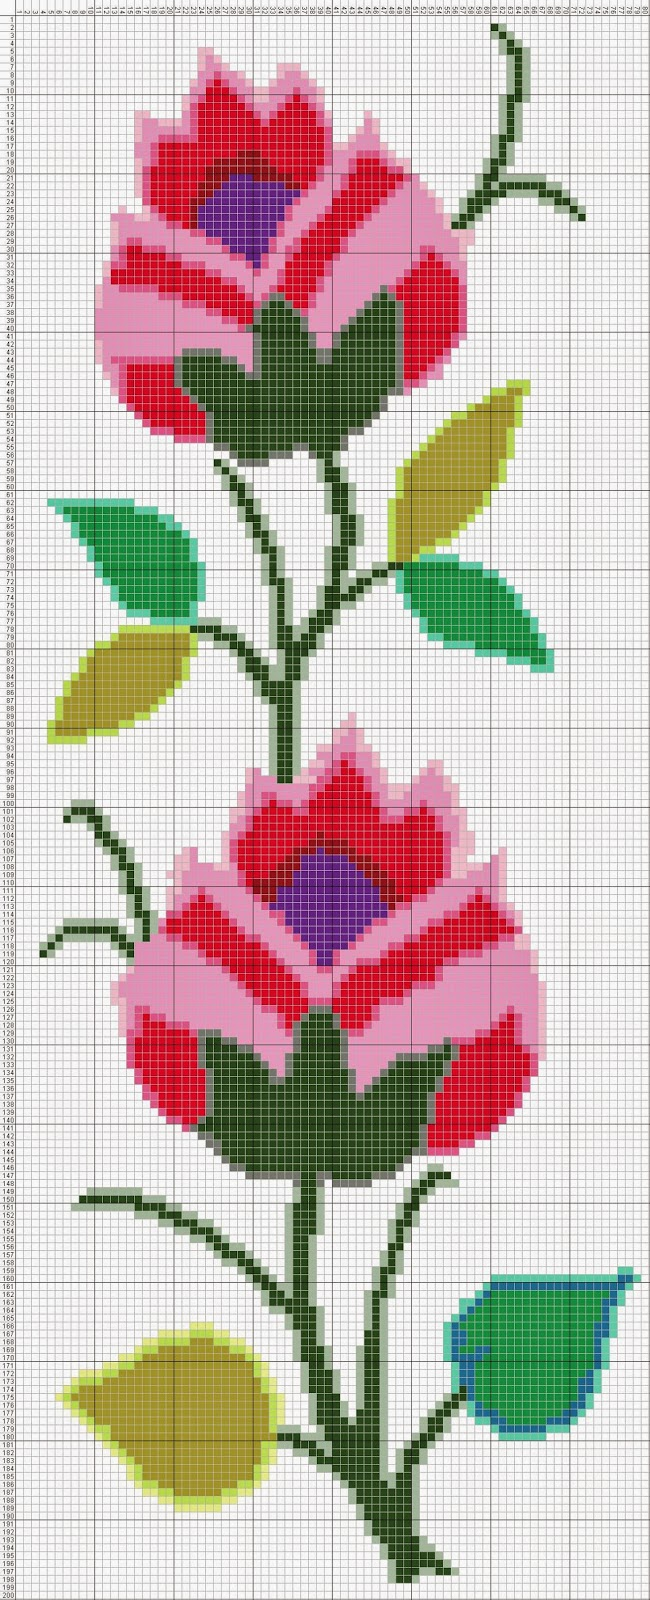 Gambar Pola Kristik Bunga Merah Ungu